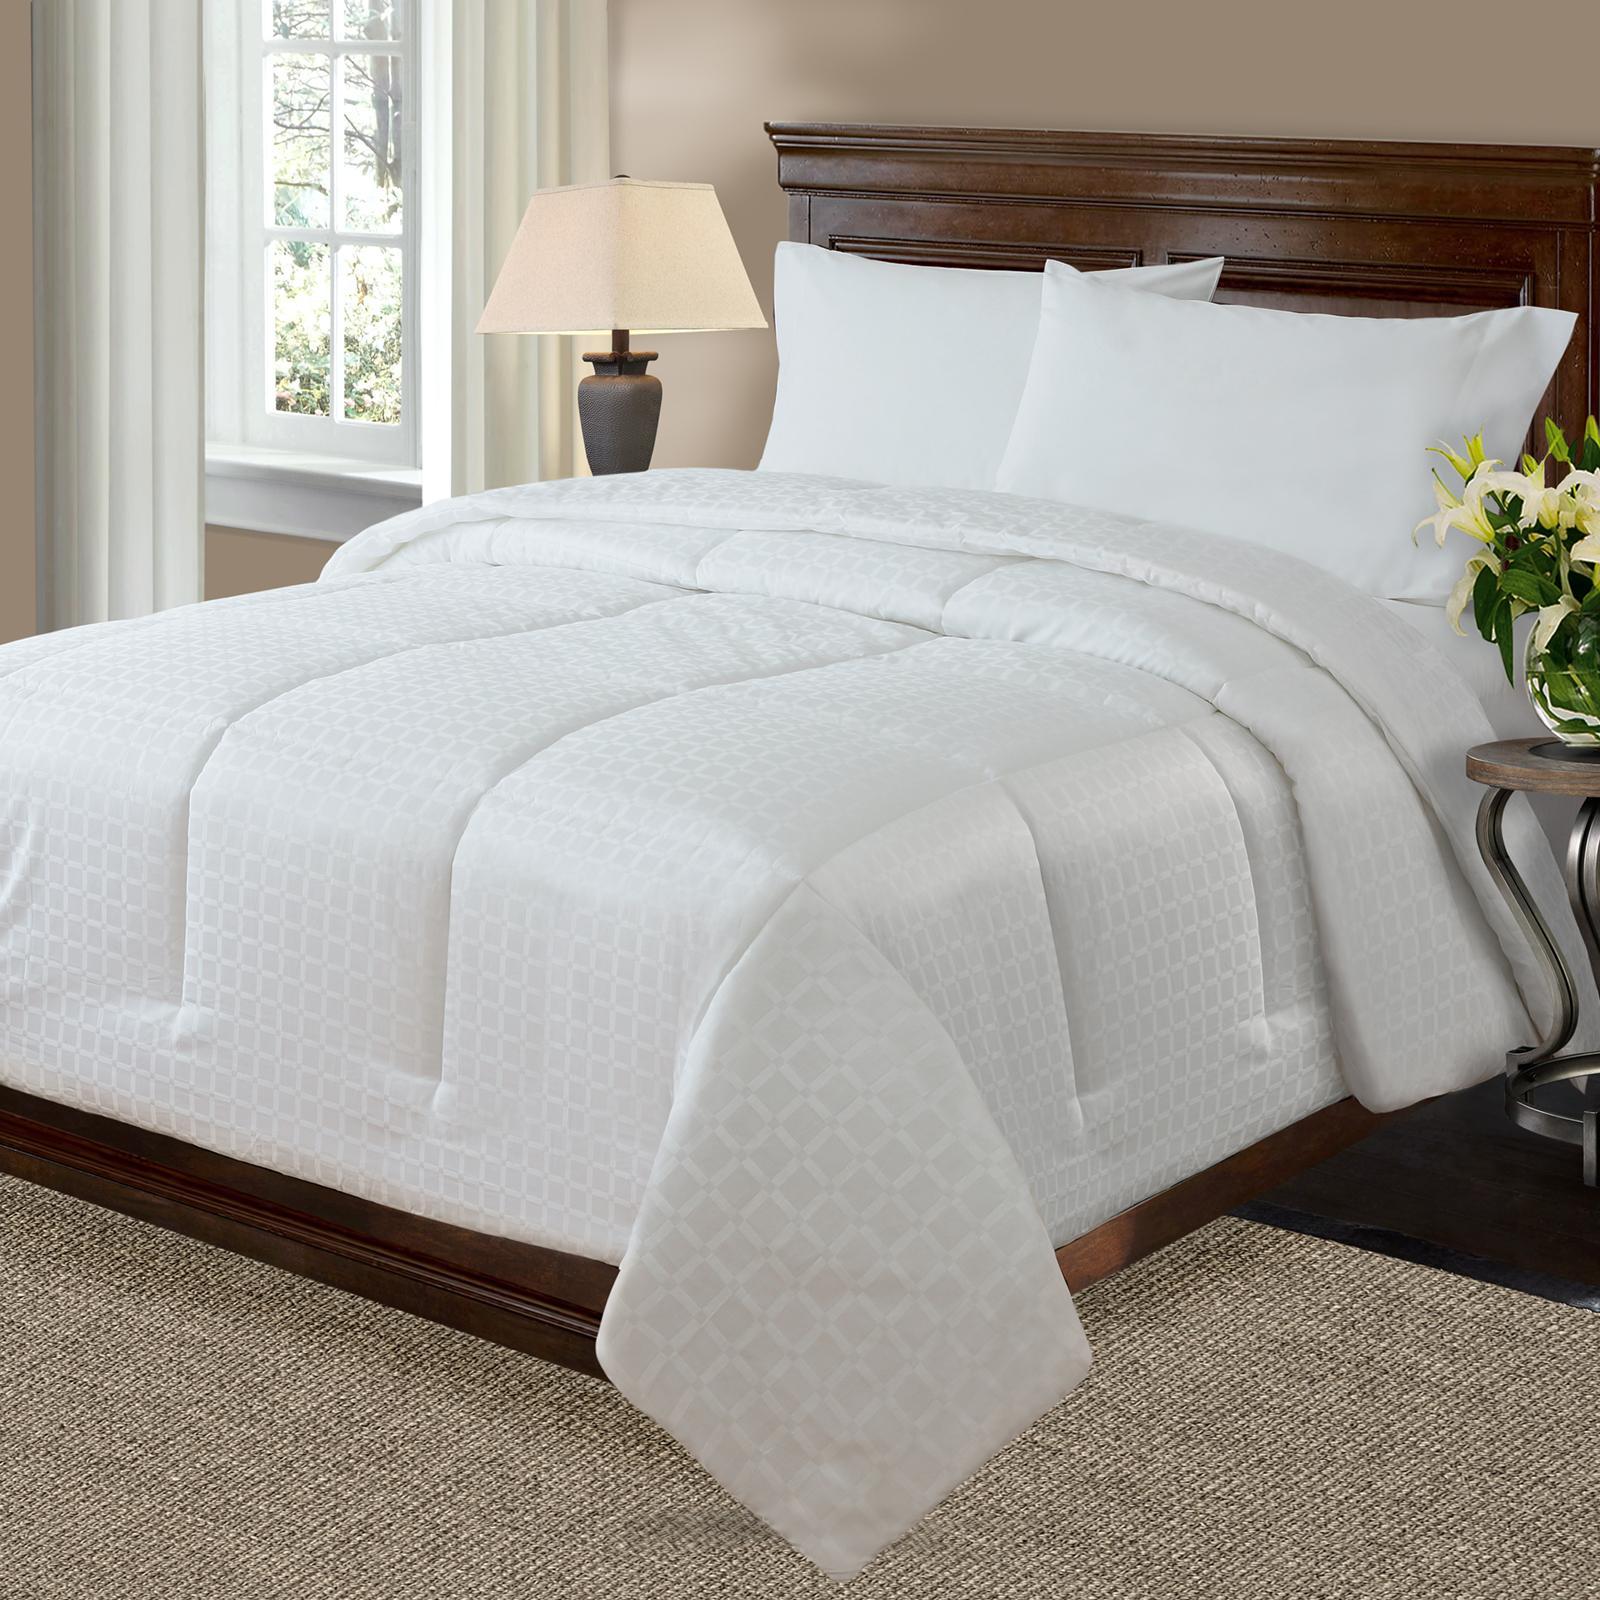 Amaze by welspun cotton sheet set bedding king navy blue - Amaze By Welspun Cotton Sheet Set Bedding King Navy Blue 17